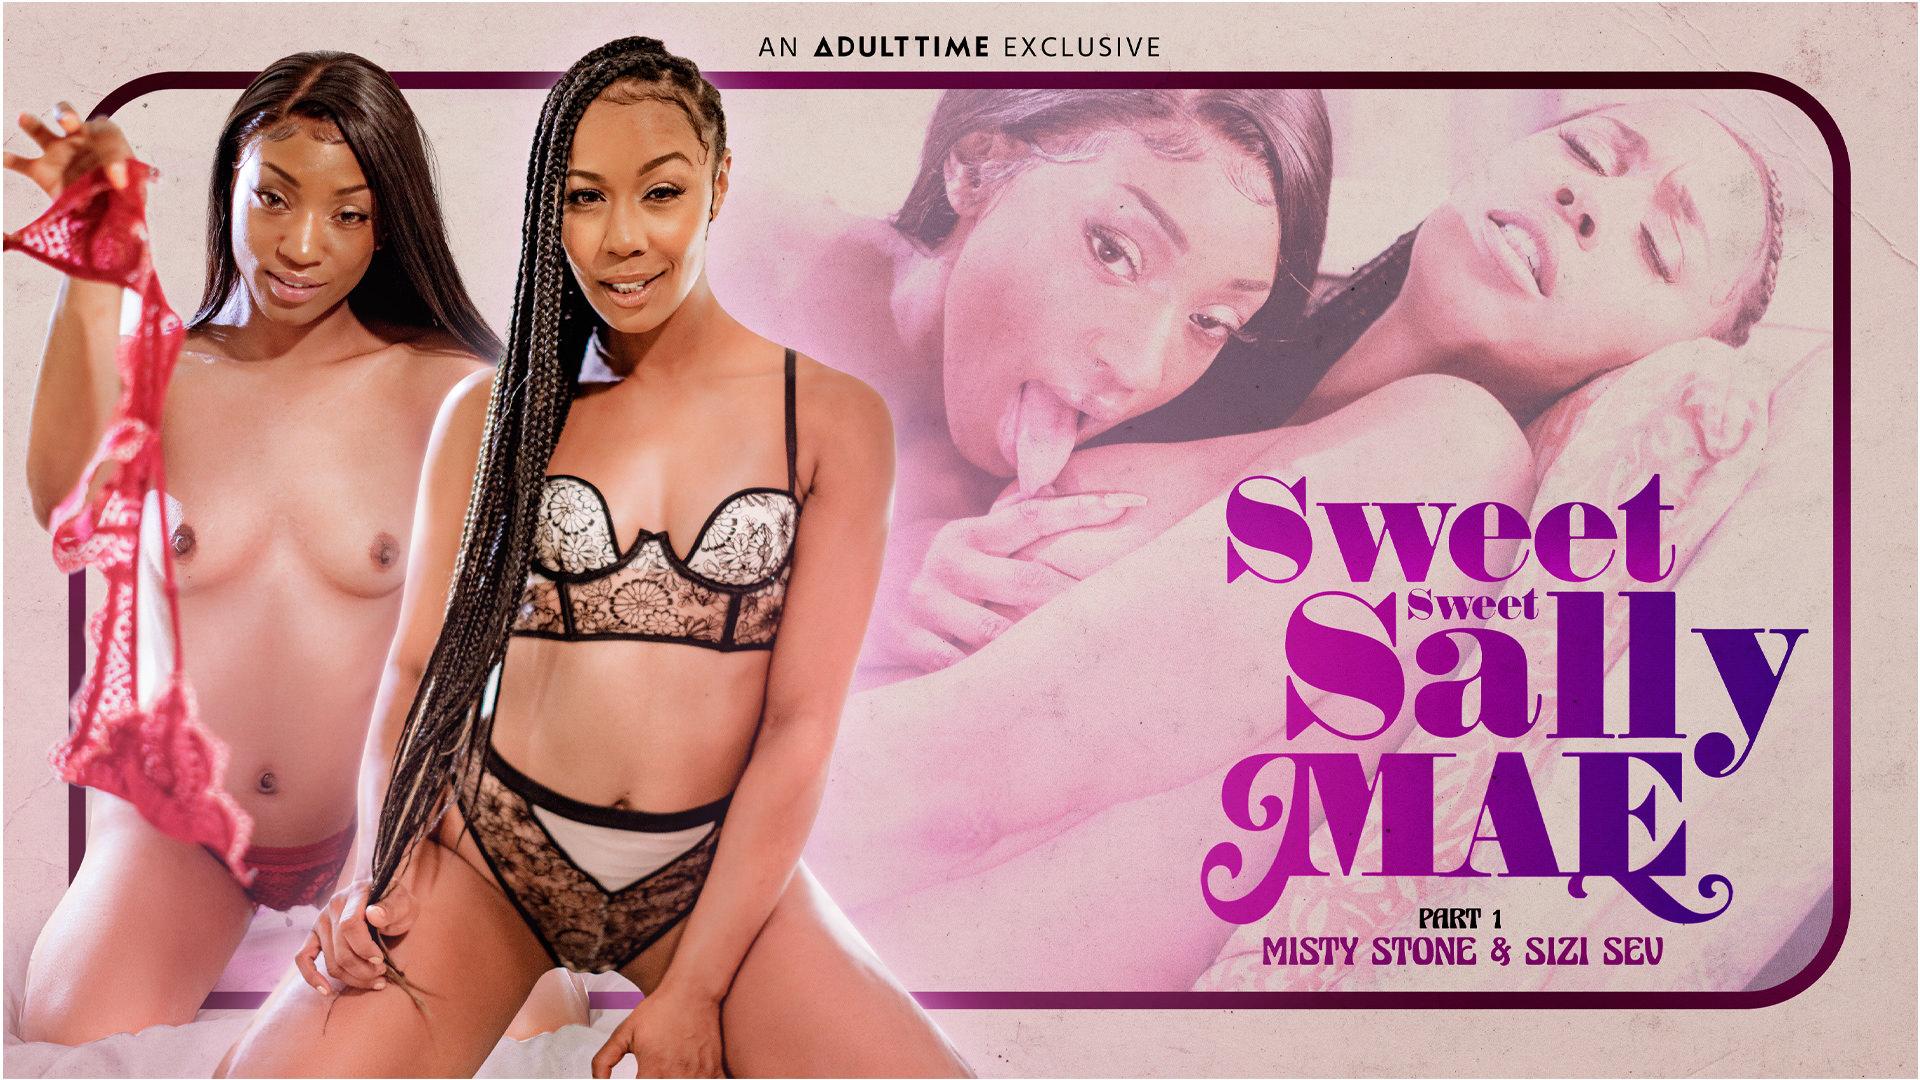 Sweet Sweet Sally Mae - Part 1 - Misty Stone & Sizi Sev 1